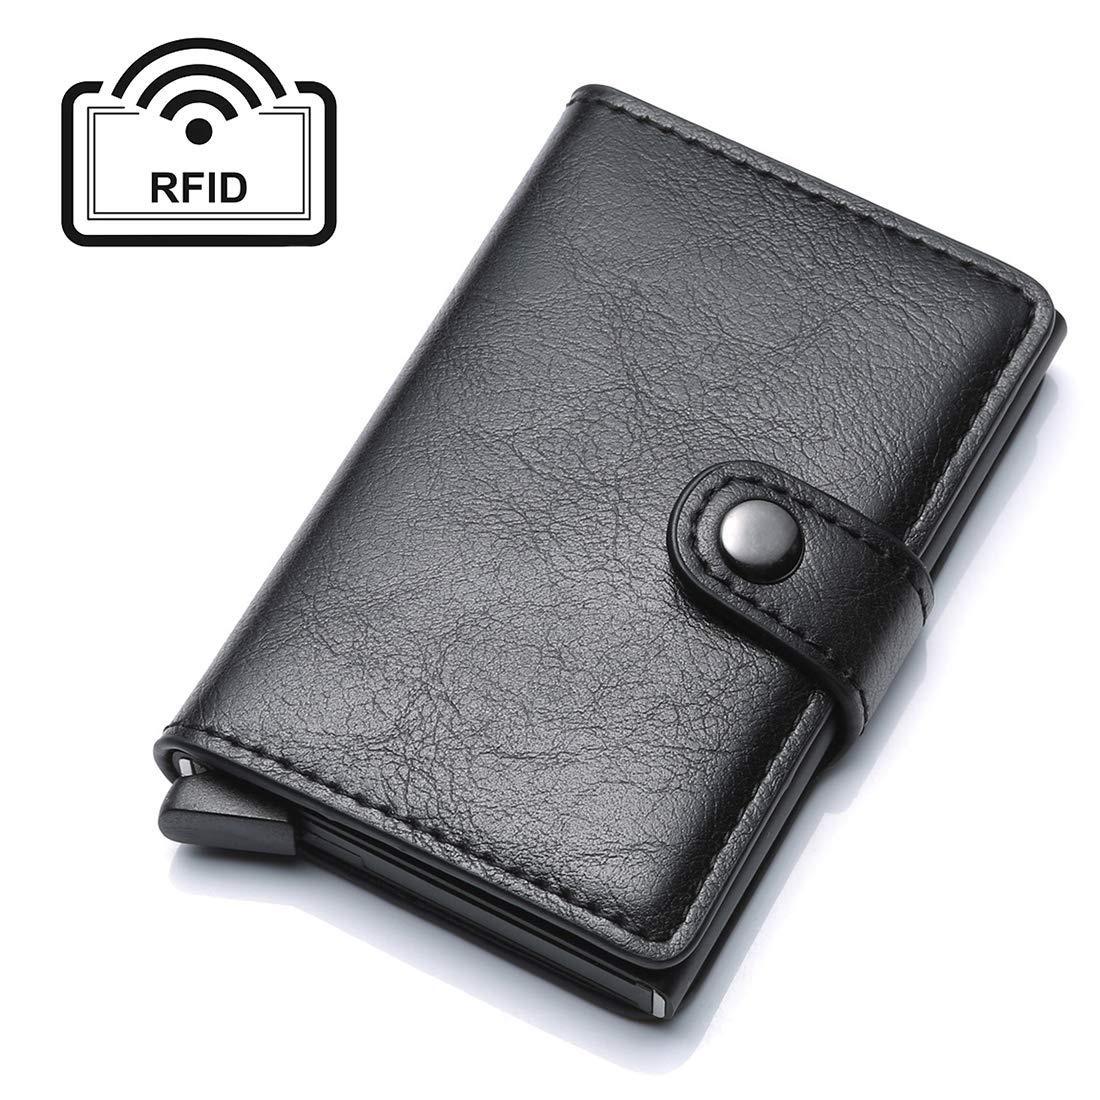 4e4da755b033 UNYU Credit Card Holder RFID Blocking Wallet Slim Wallet Genuine Leather  Vintage Aluminium Business Card Holder Automatic Pop-up Card Case Wallet ...